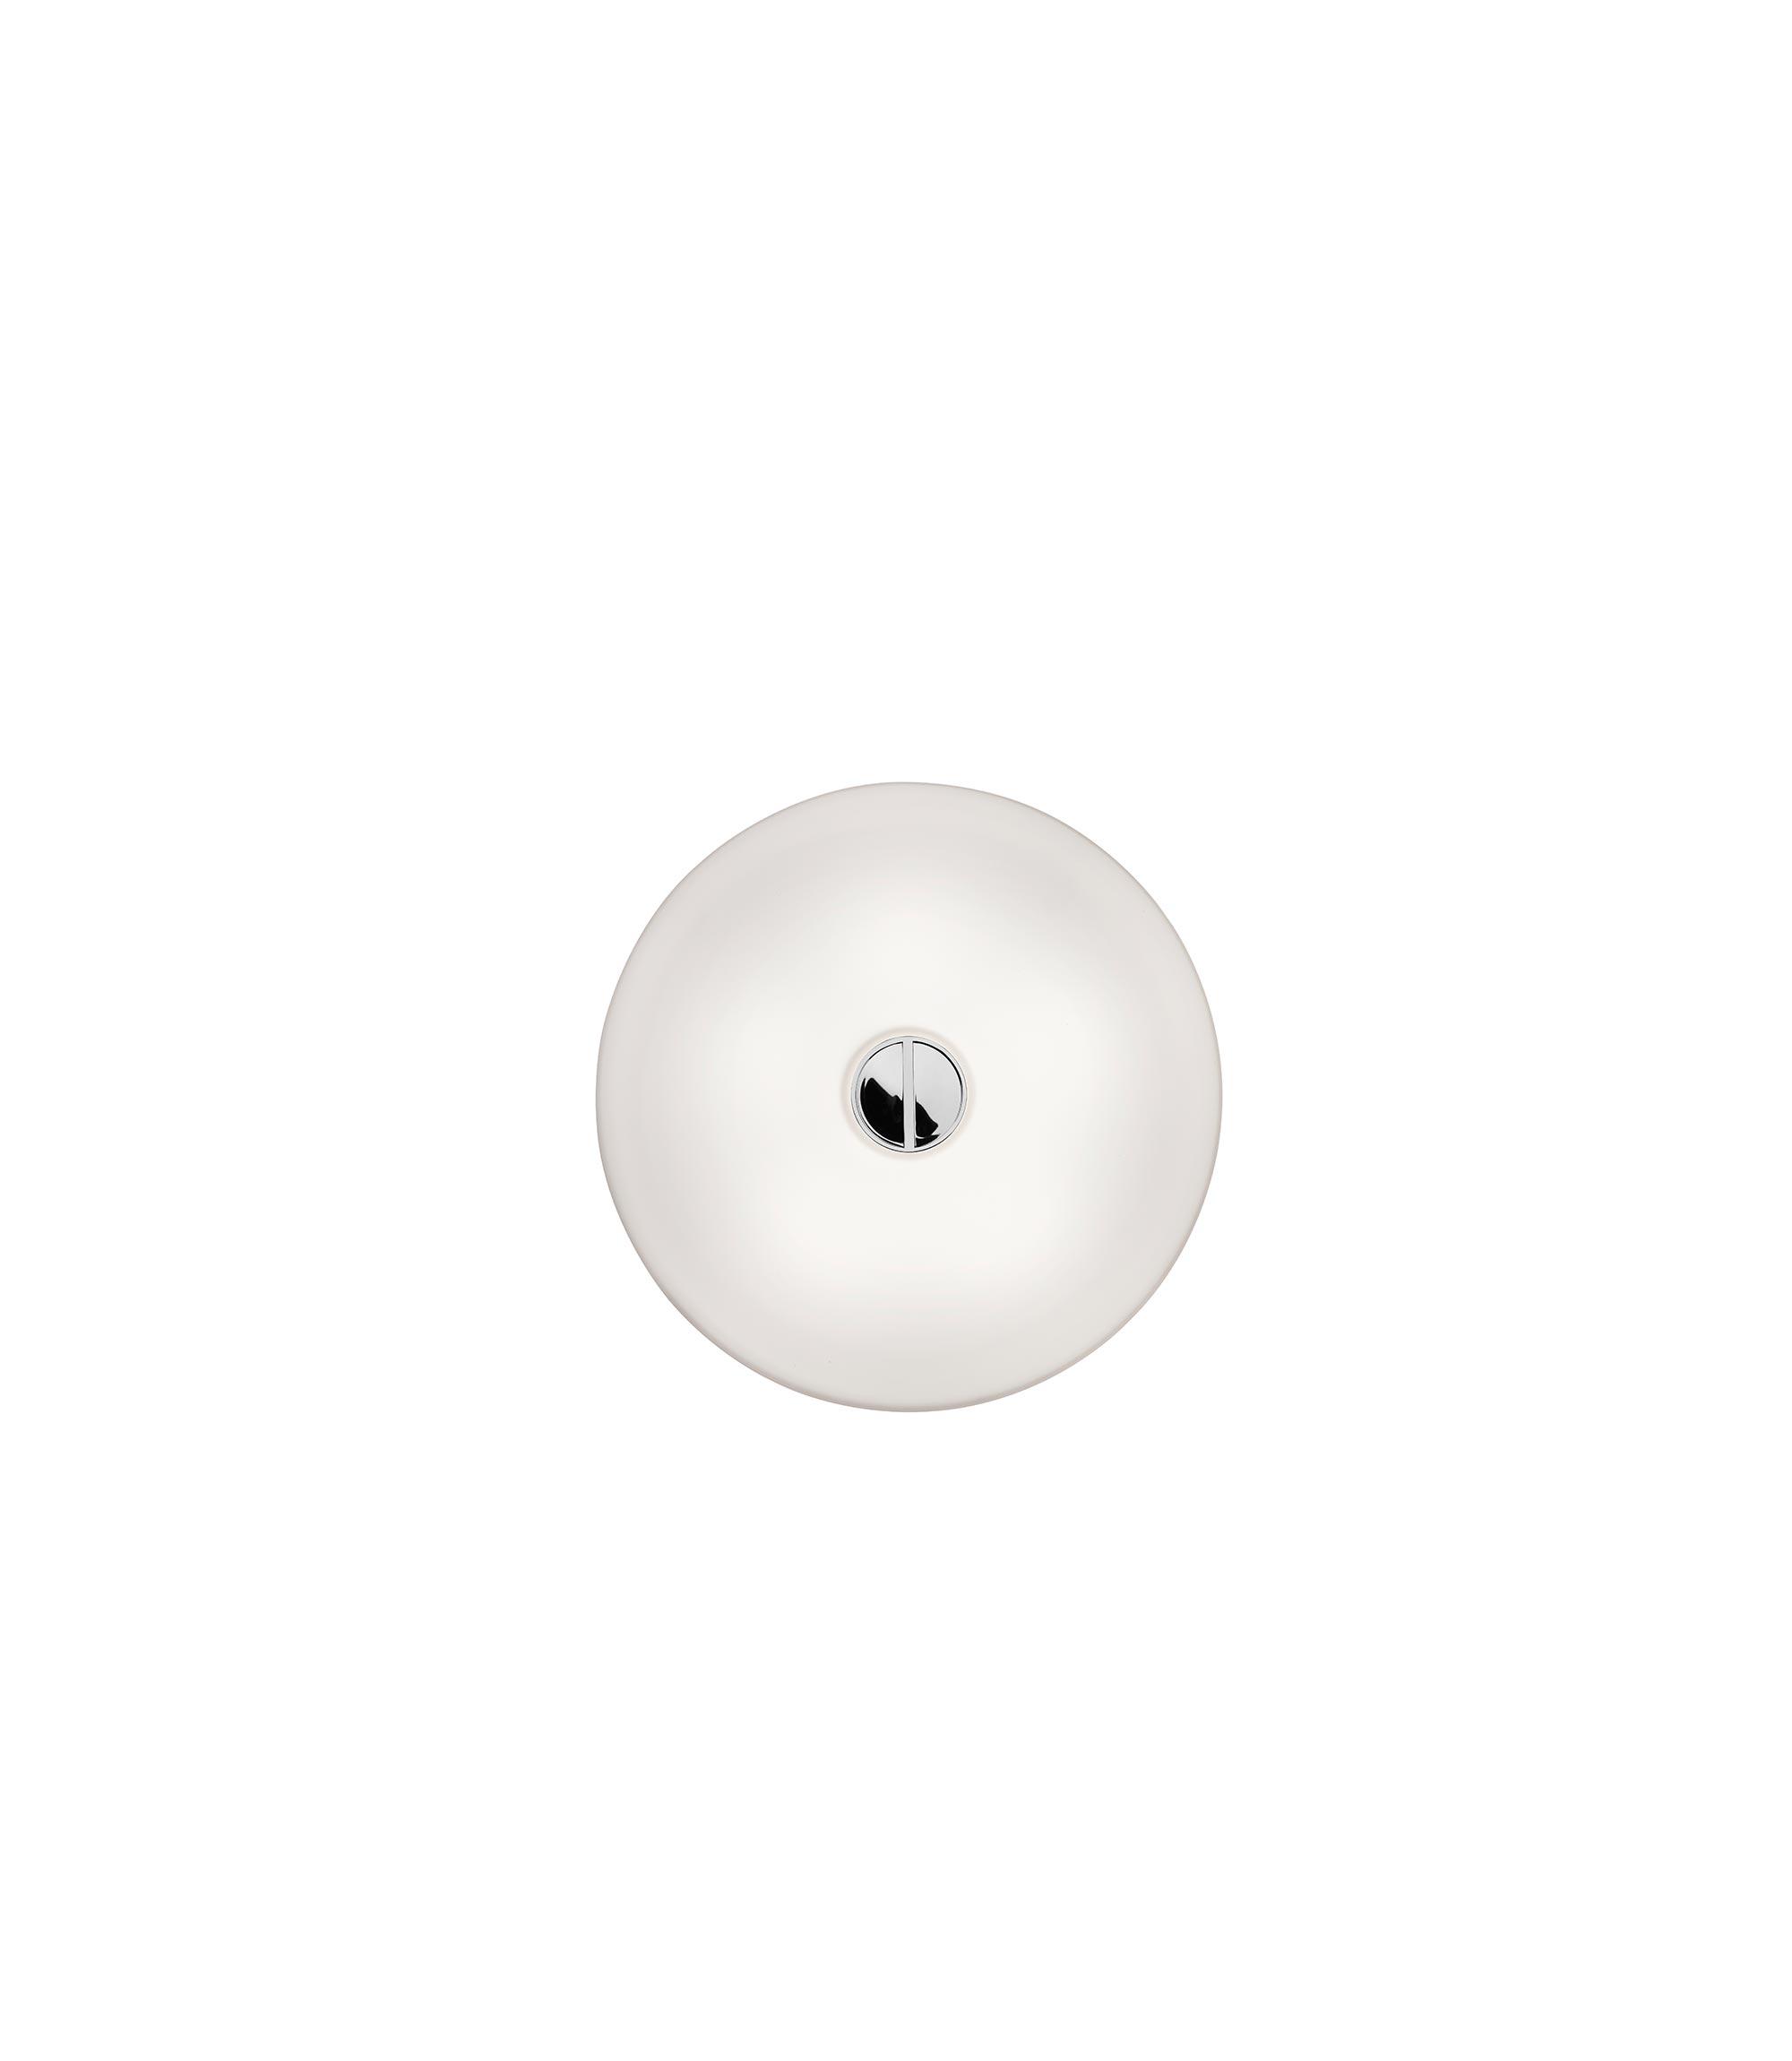 Button ceiling wall lissoni flos F3190009 product still life big 1